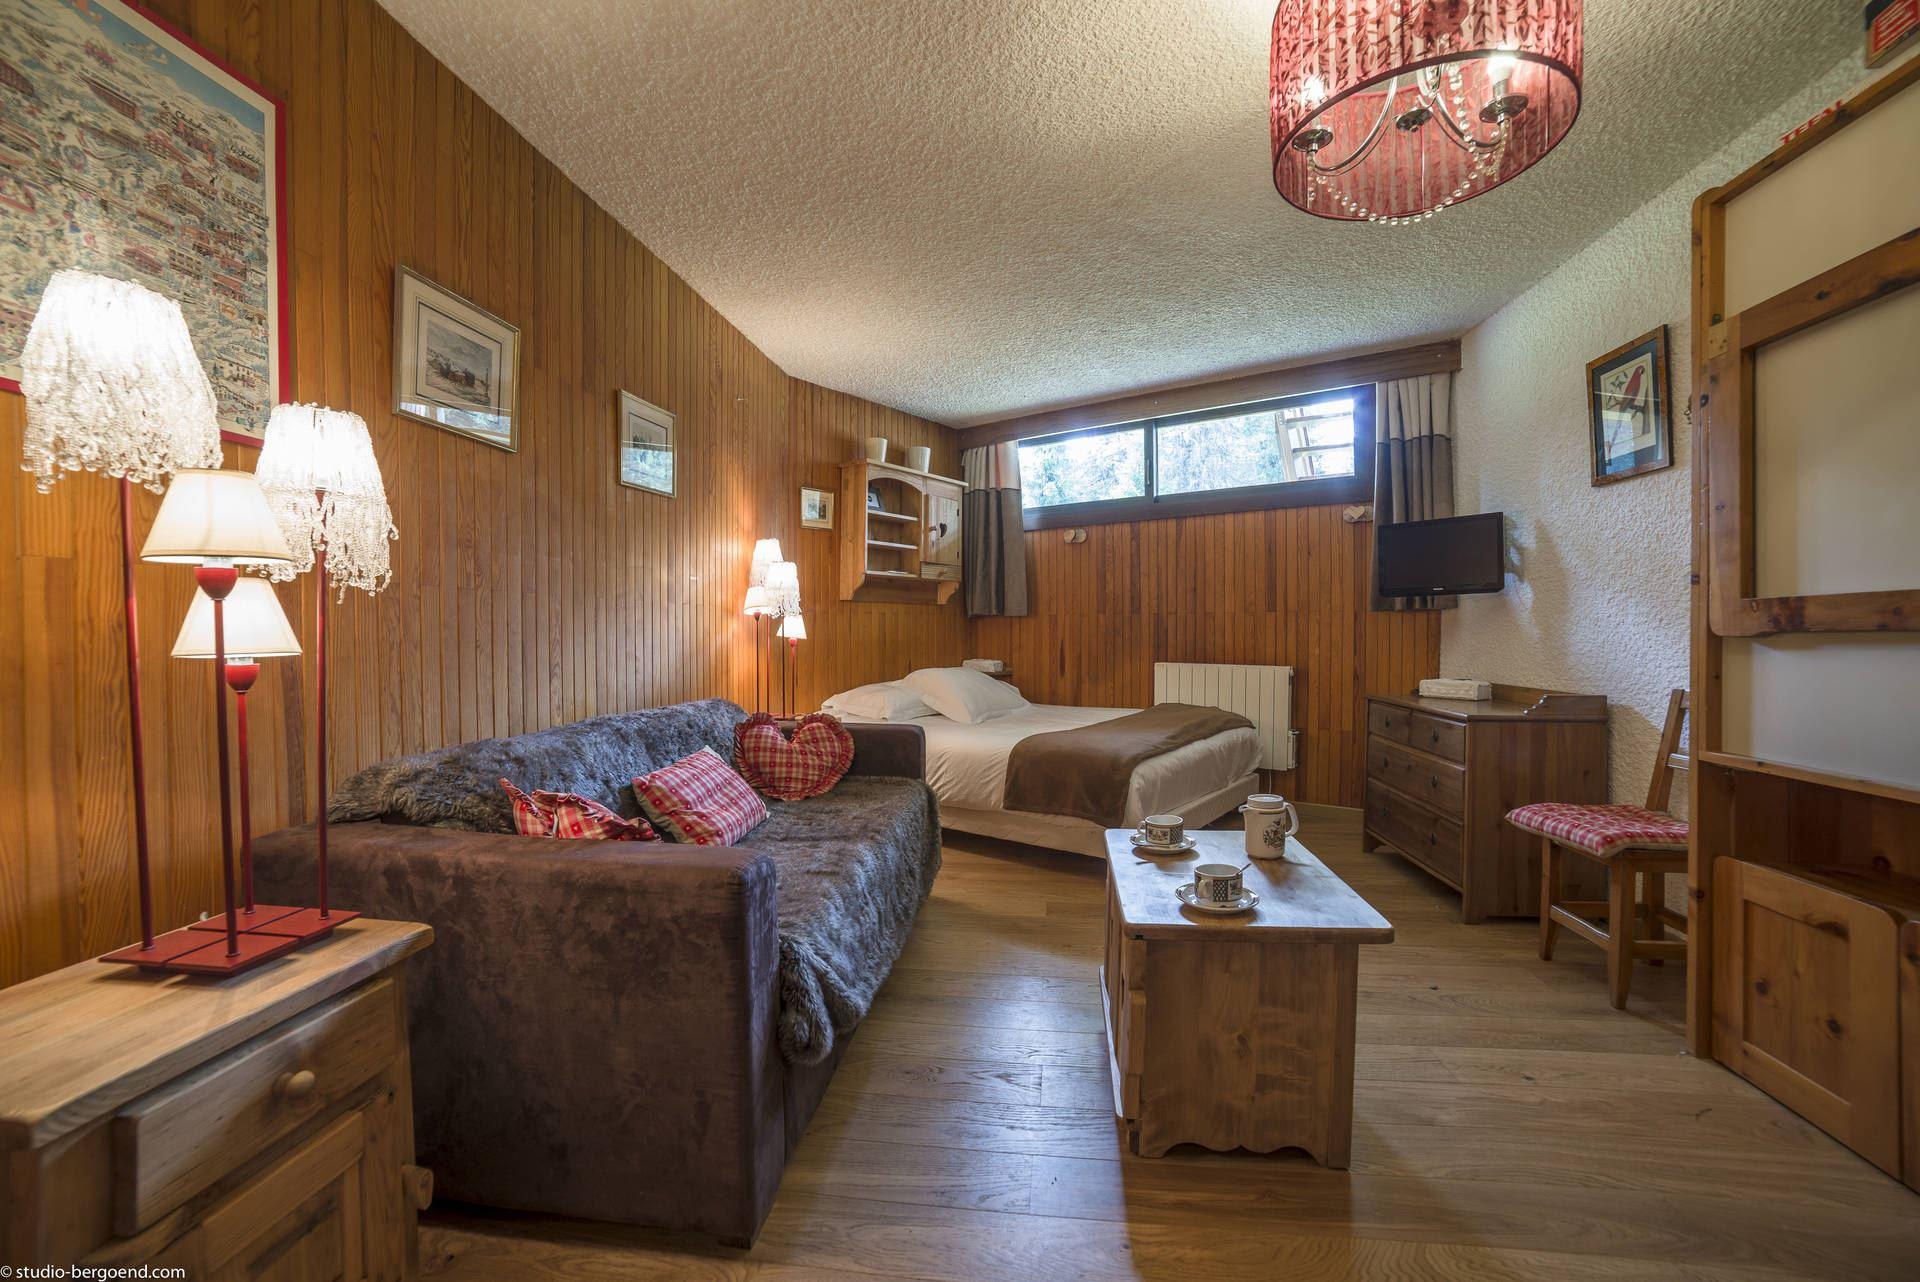 1 studio 4 persons, ski-in ski-out / Domaine du Jardin Alpin 6B (Mountain)